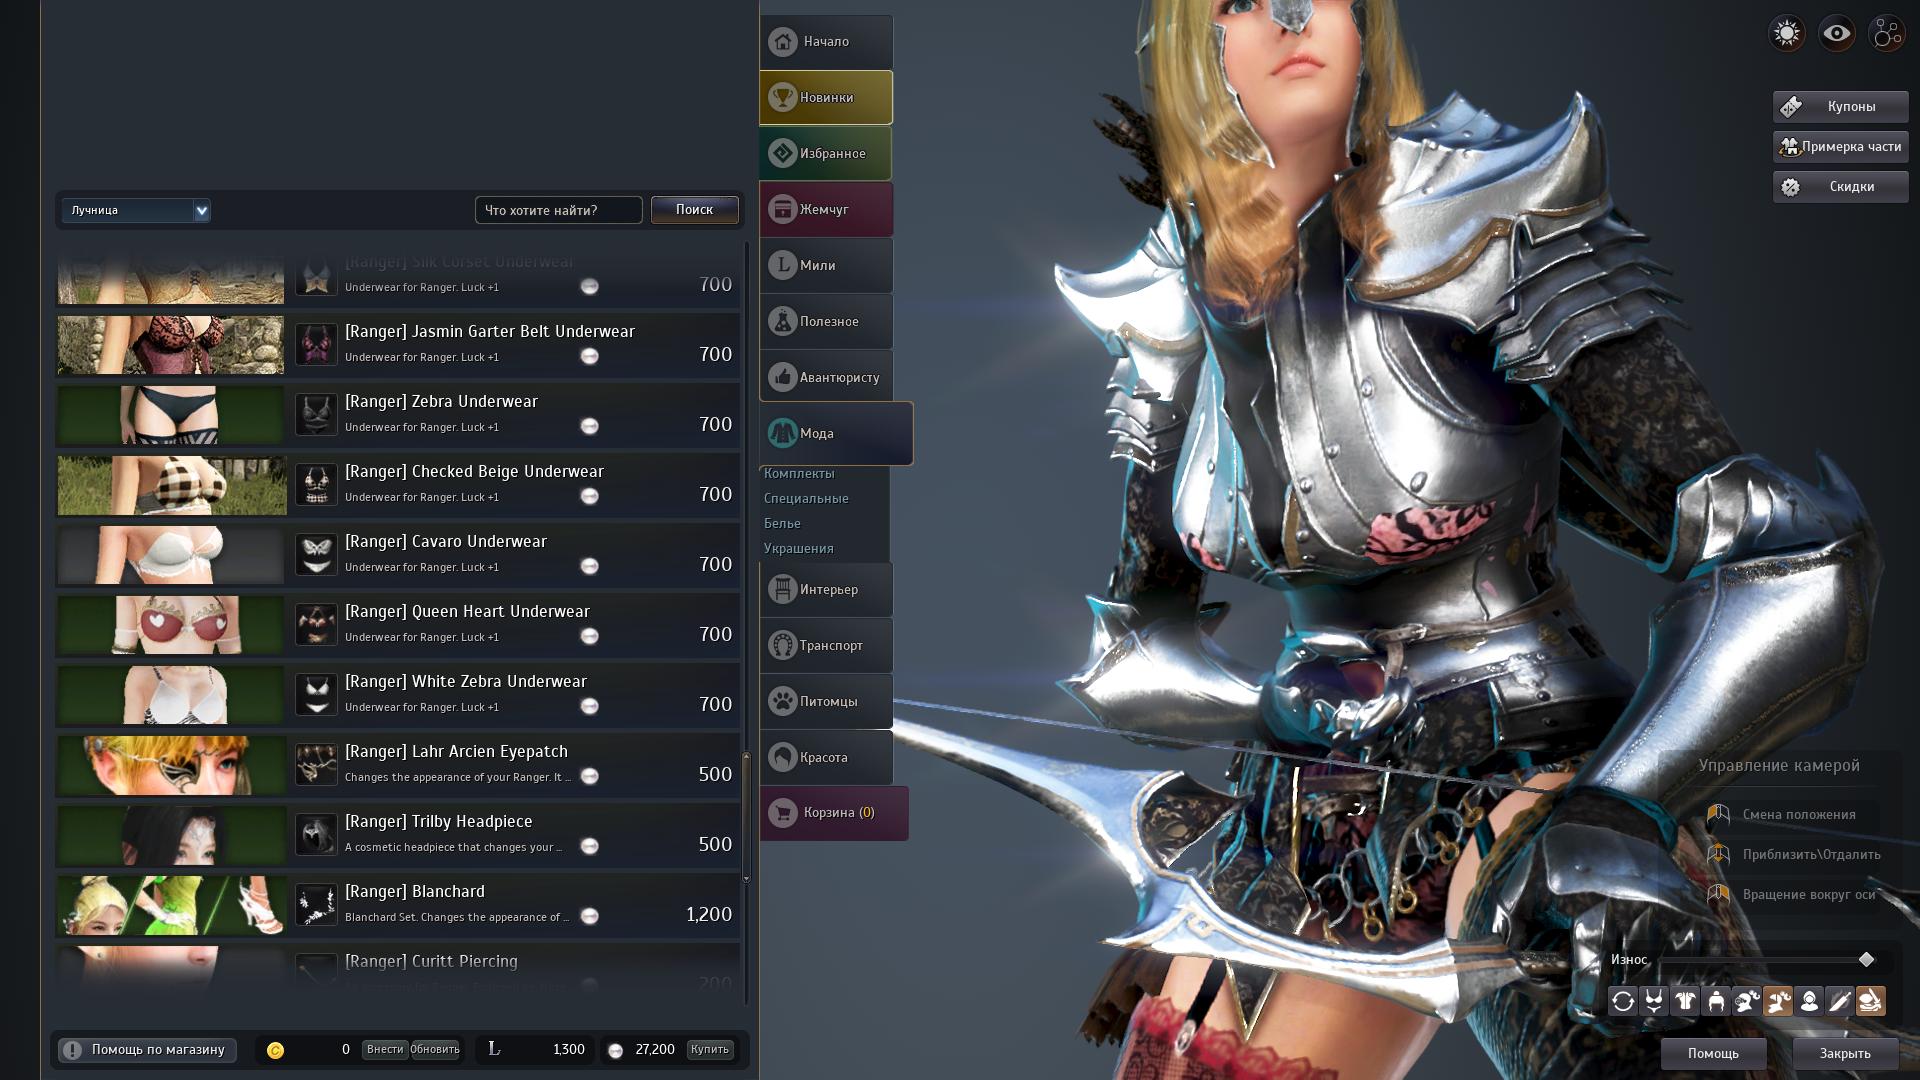 Desktop Screenshot 2020.03.23 - 13.26.17.01.png